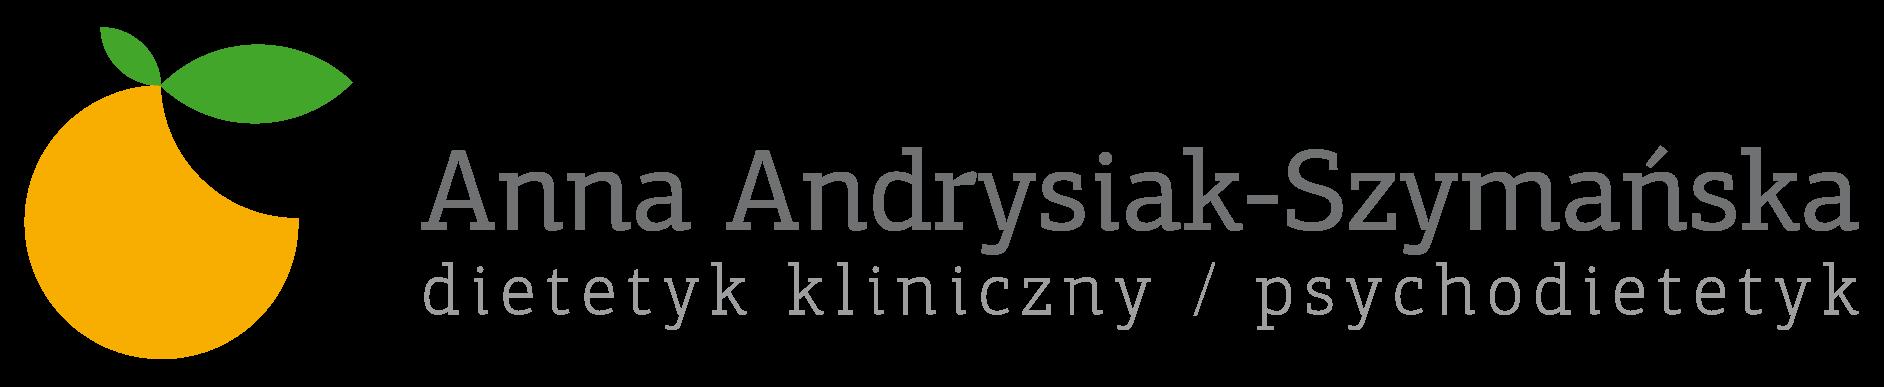 Anna Andrysiak-Szymańska